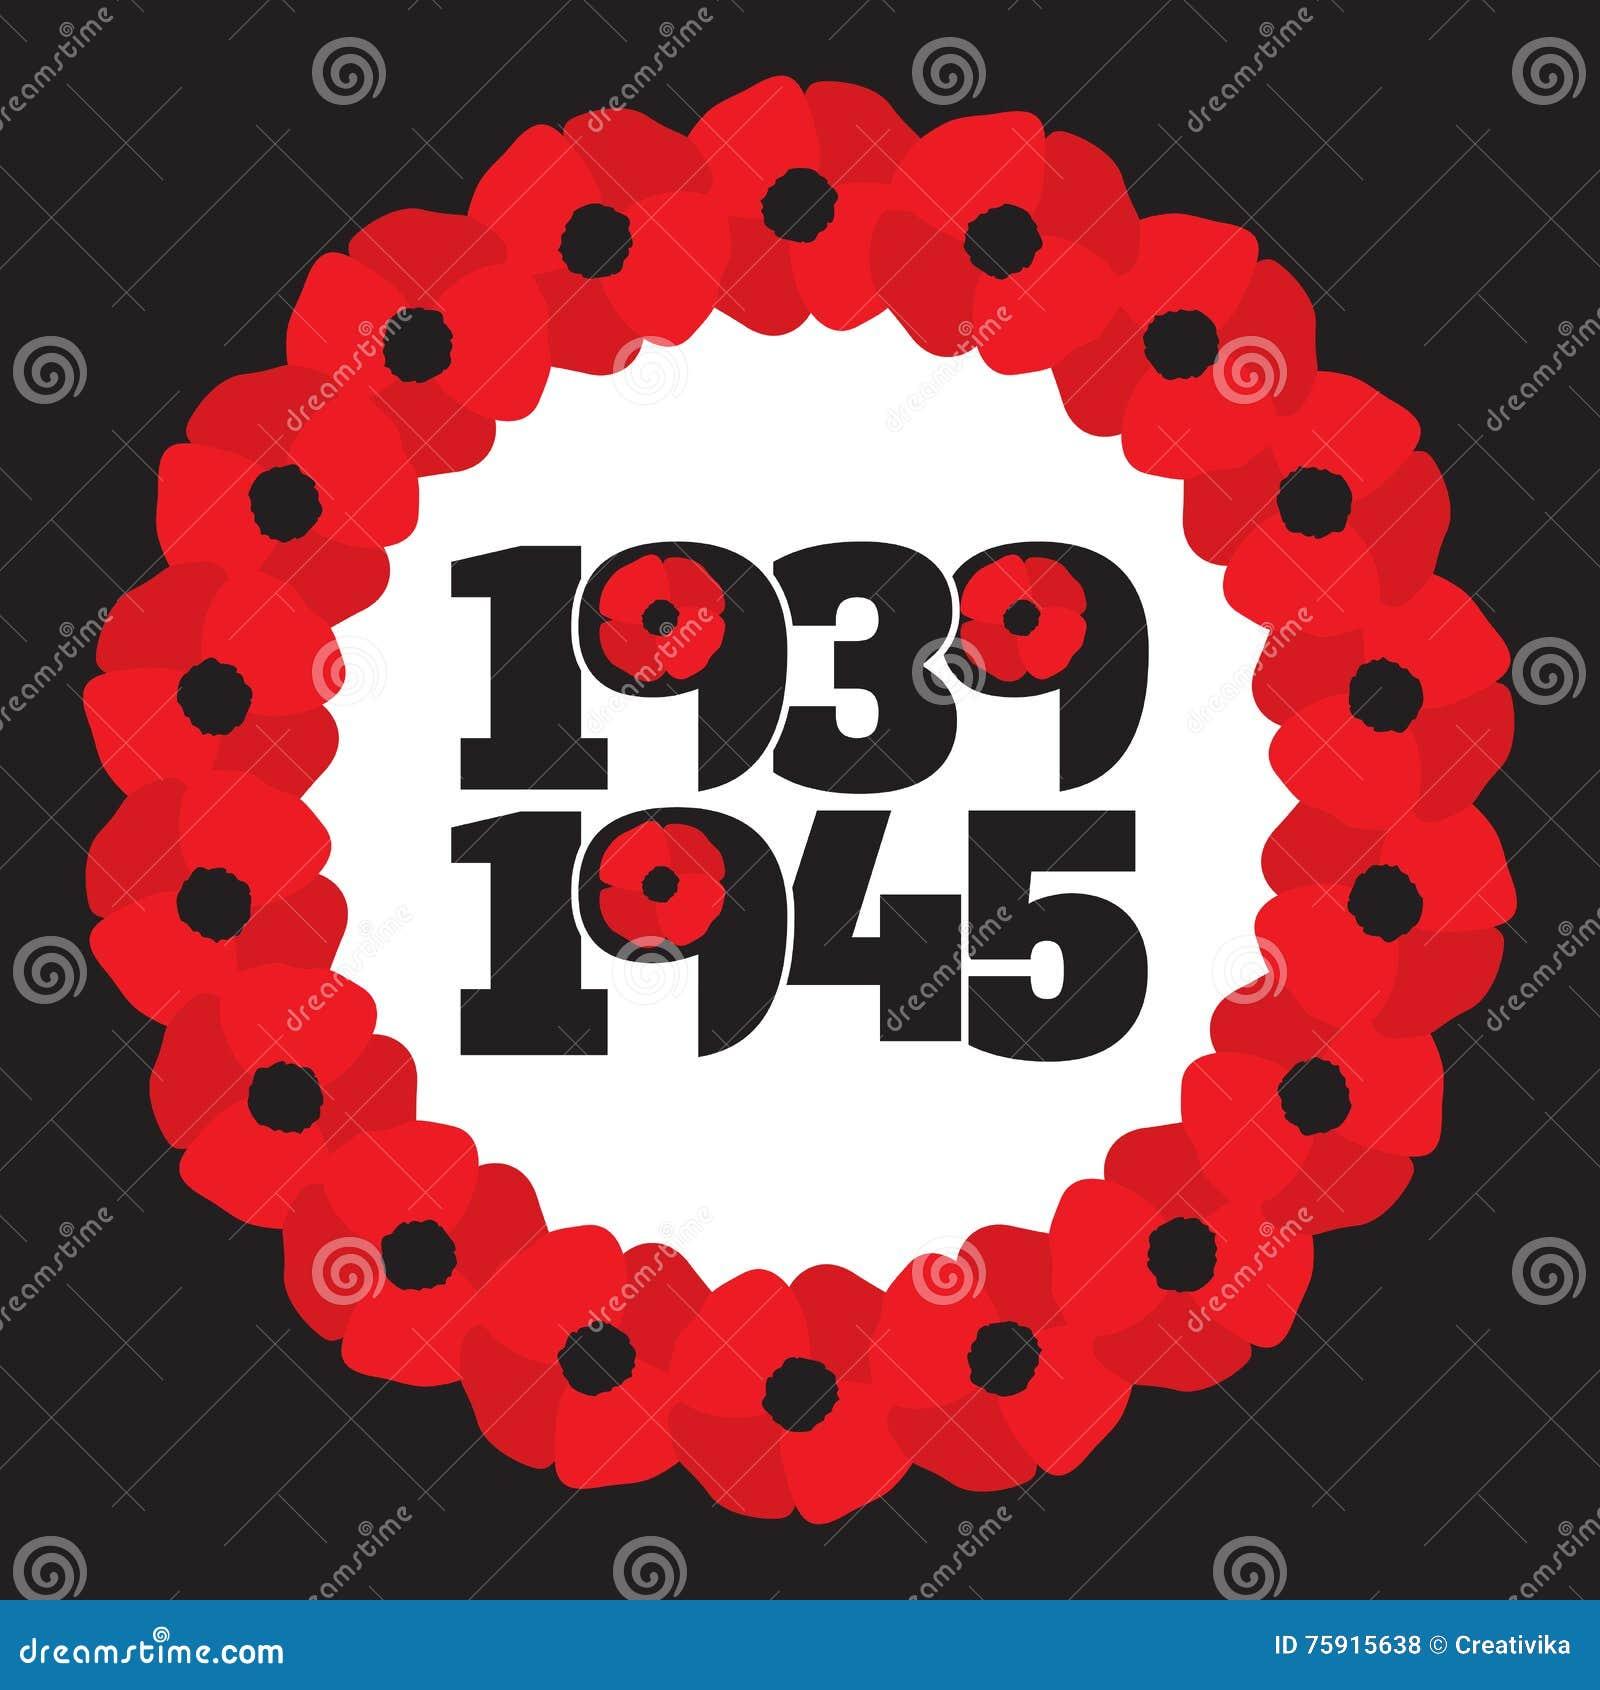 World war ii commemorative symbol with dates poppies stock vector world war ii commemorative symbol with dates poppies buycottarizona Gallery